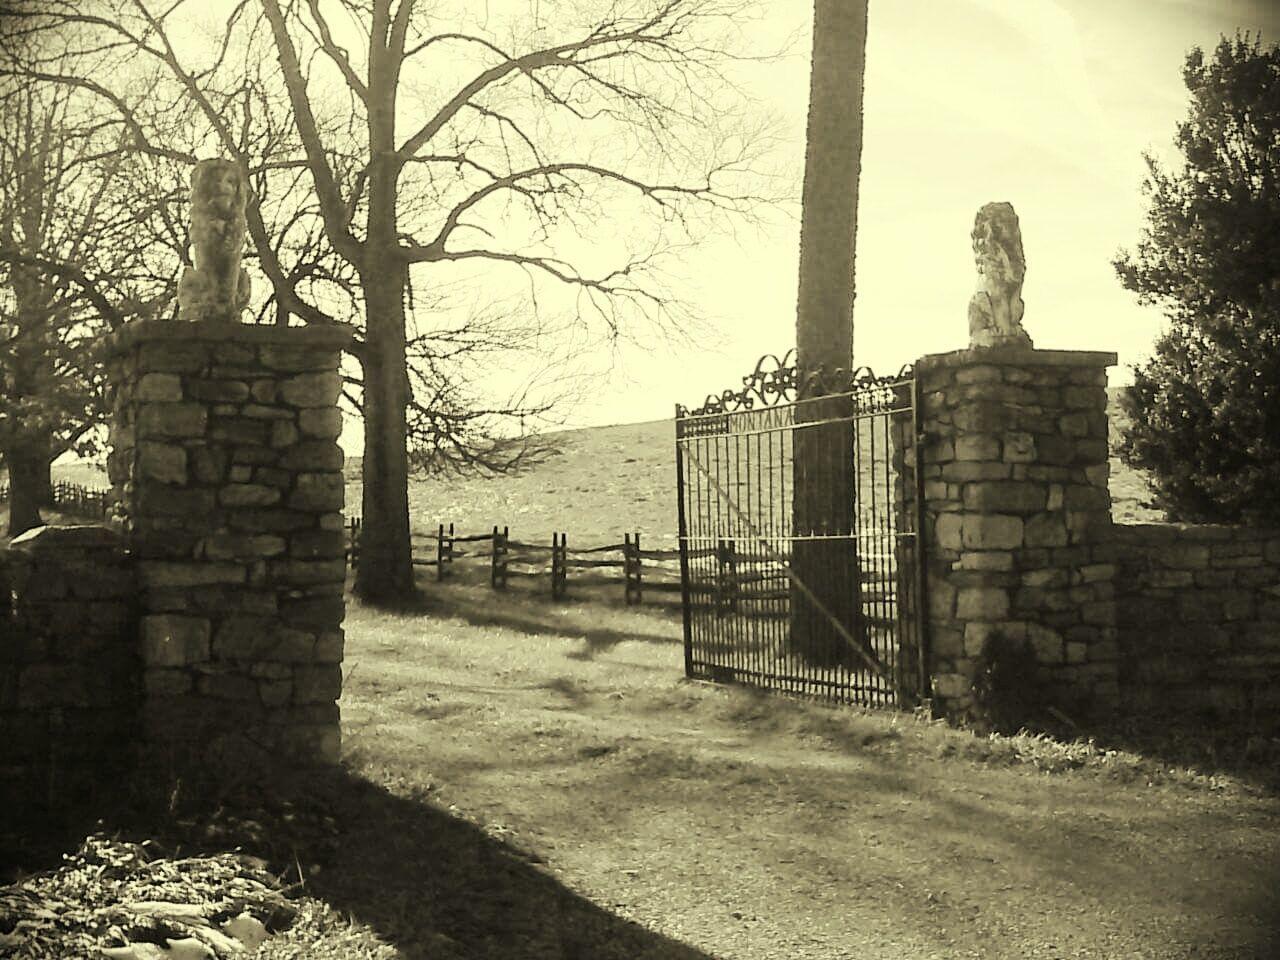 Virginia Estate Contry Iron And Stone Stone Columns Wrought Iron Gate Autumn Peaceful Trees